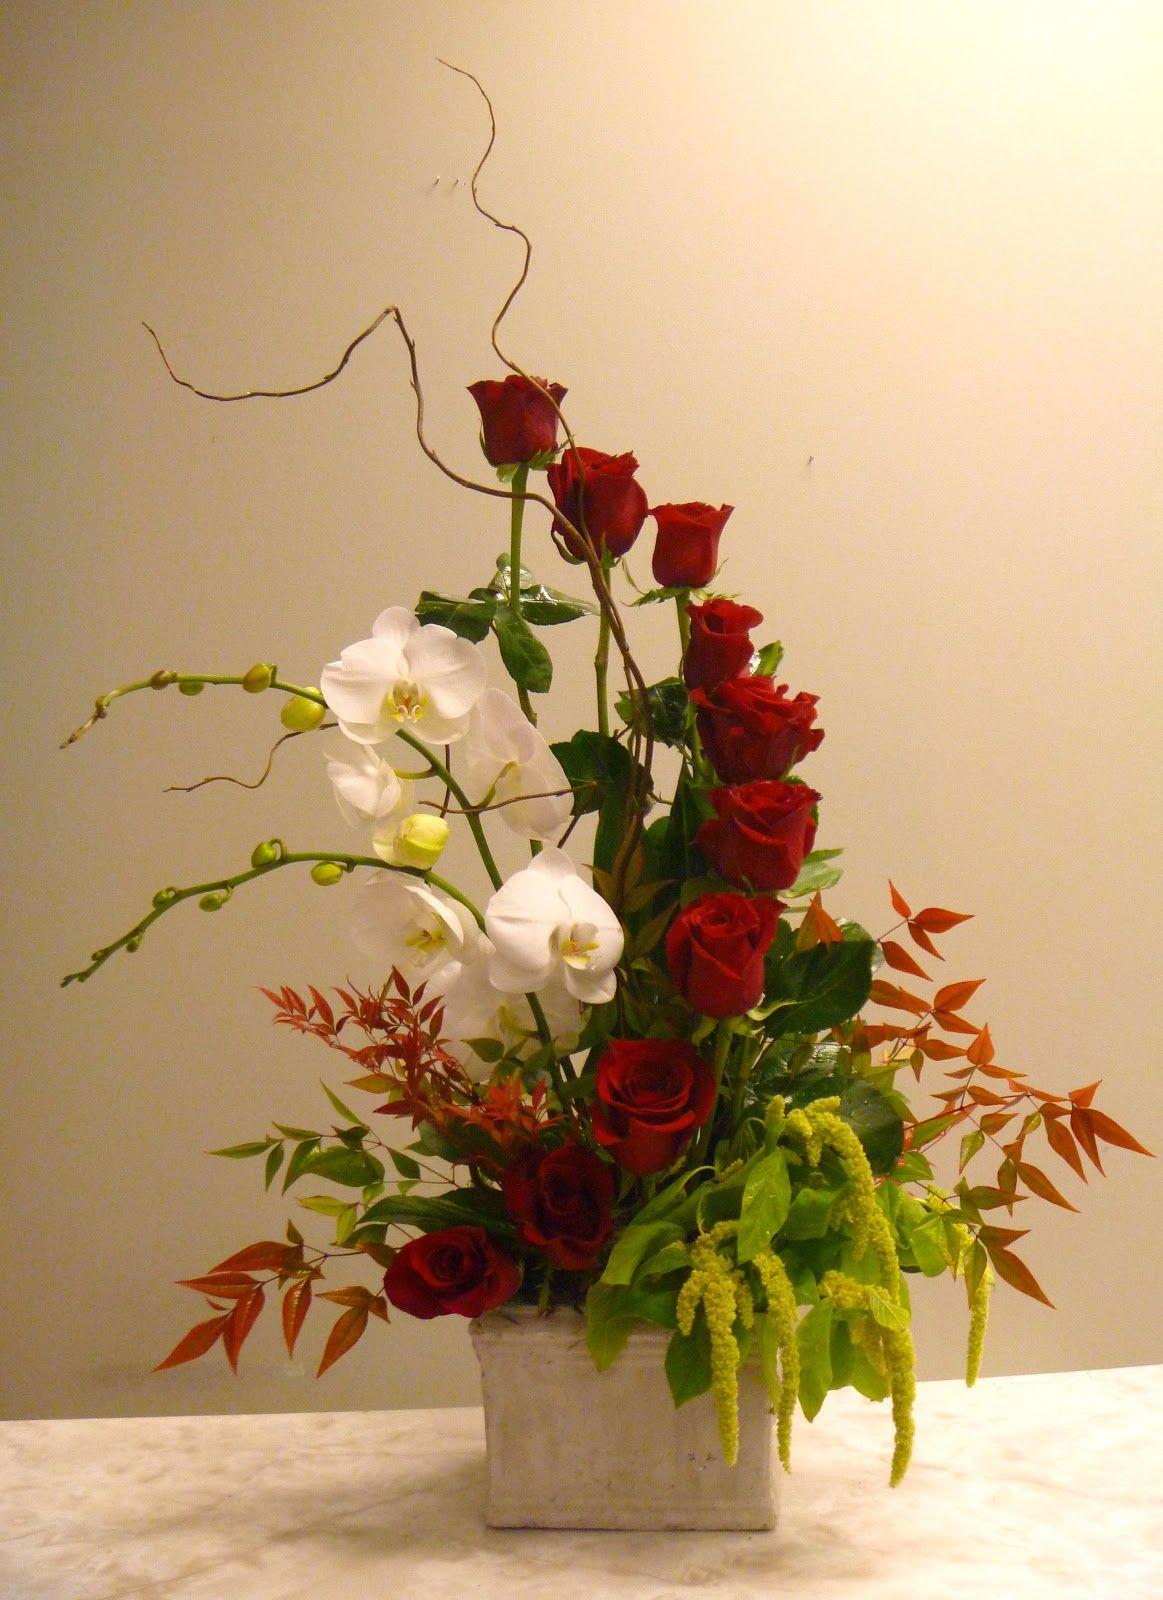 Unique Valentines Rose Arrangement Designed By Kari Schriever Of